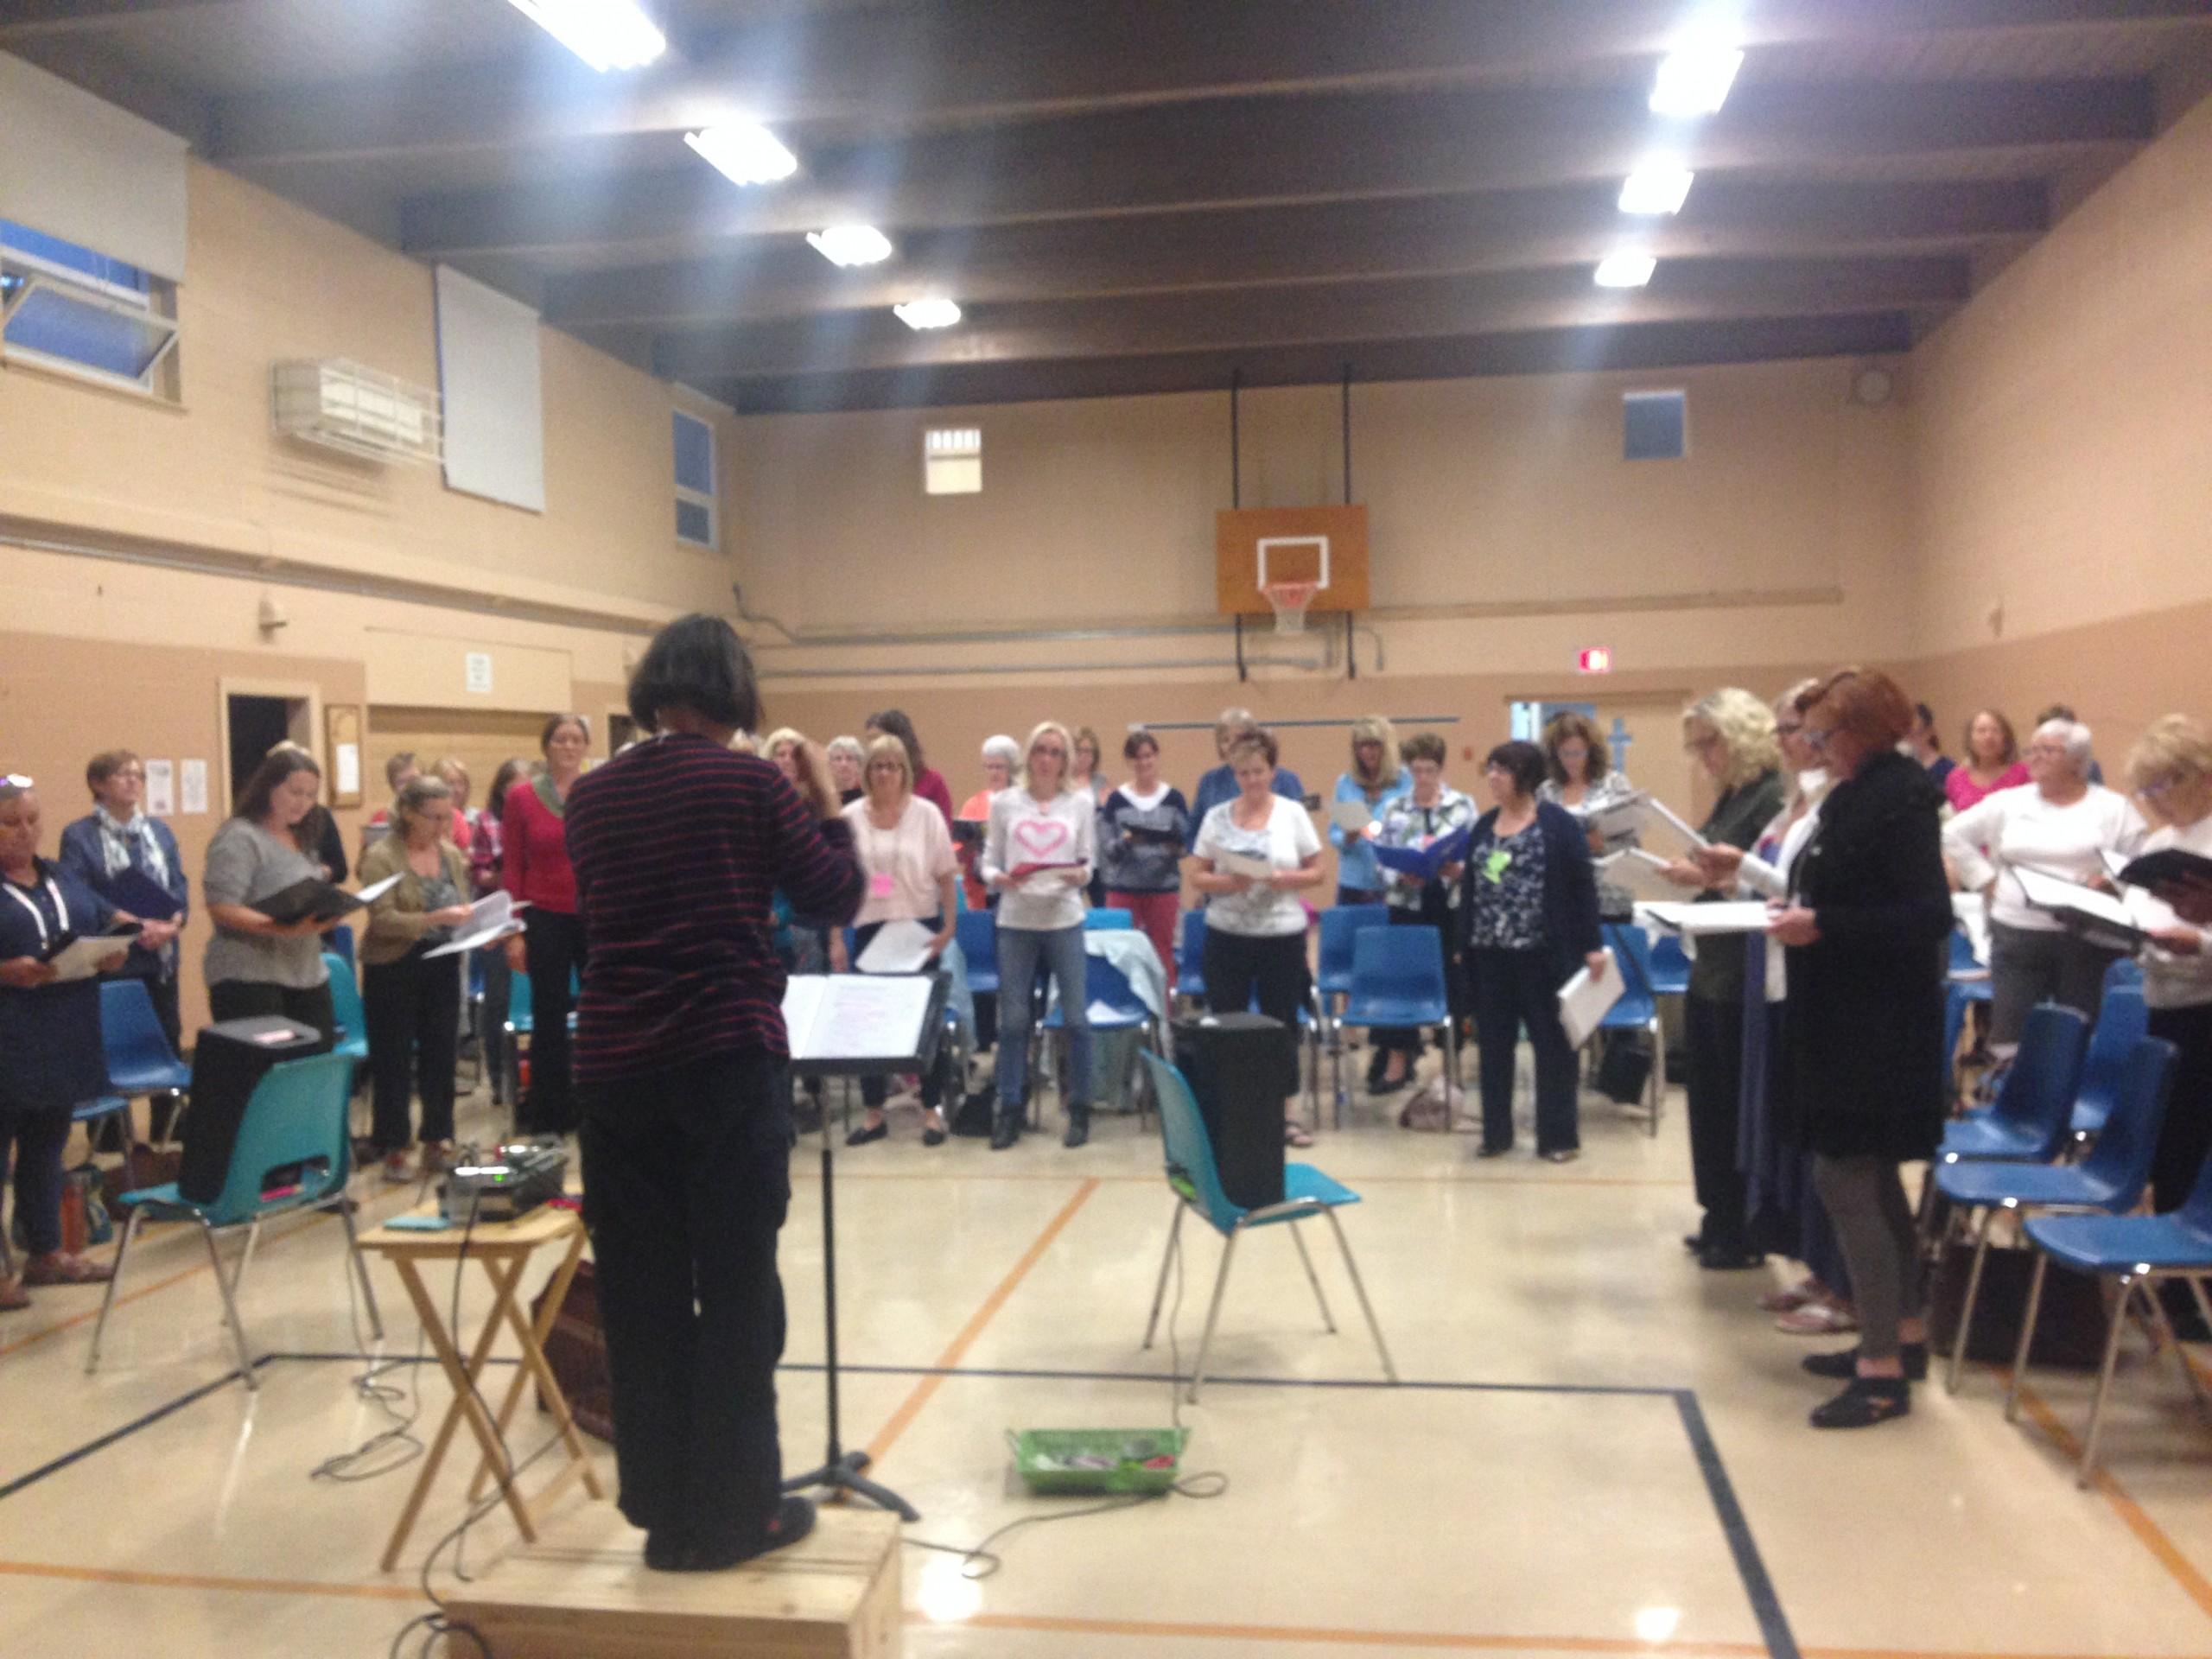 Shout Sisters! Ontario's largest growing choir